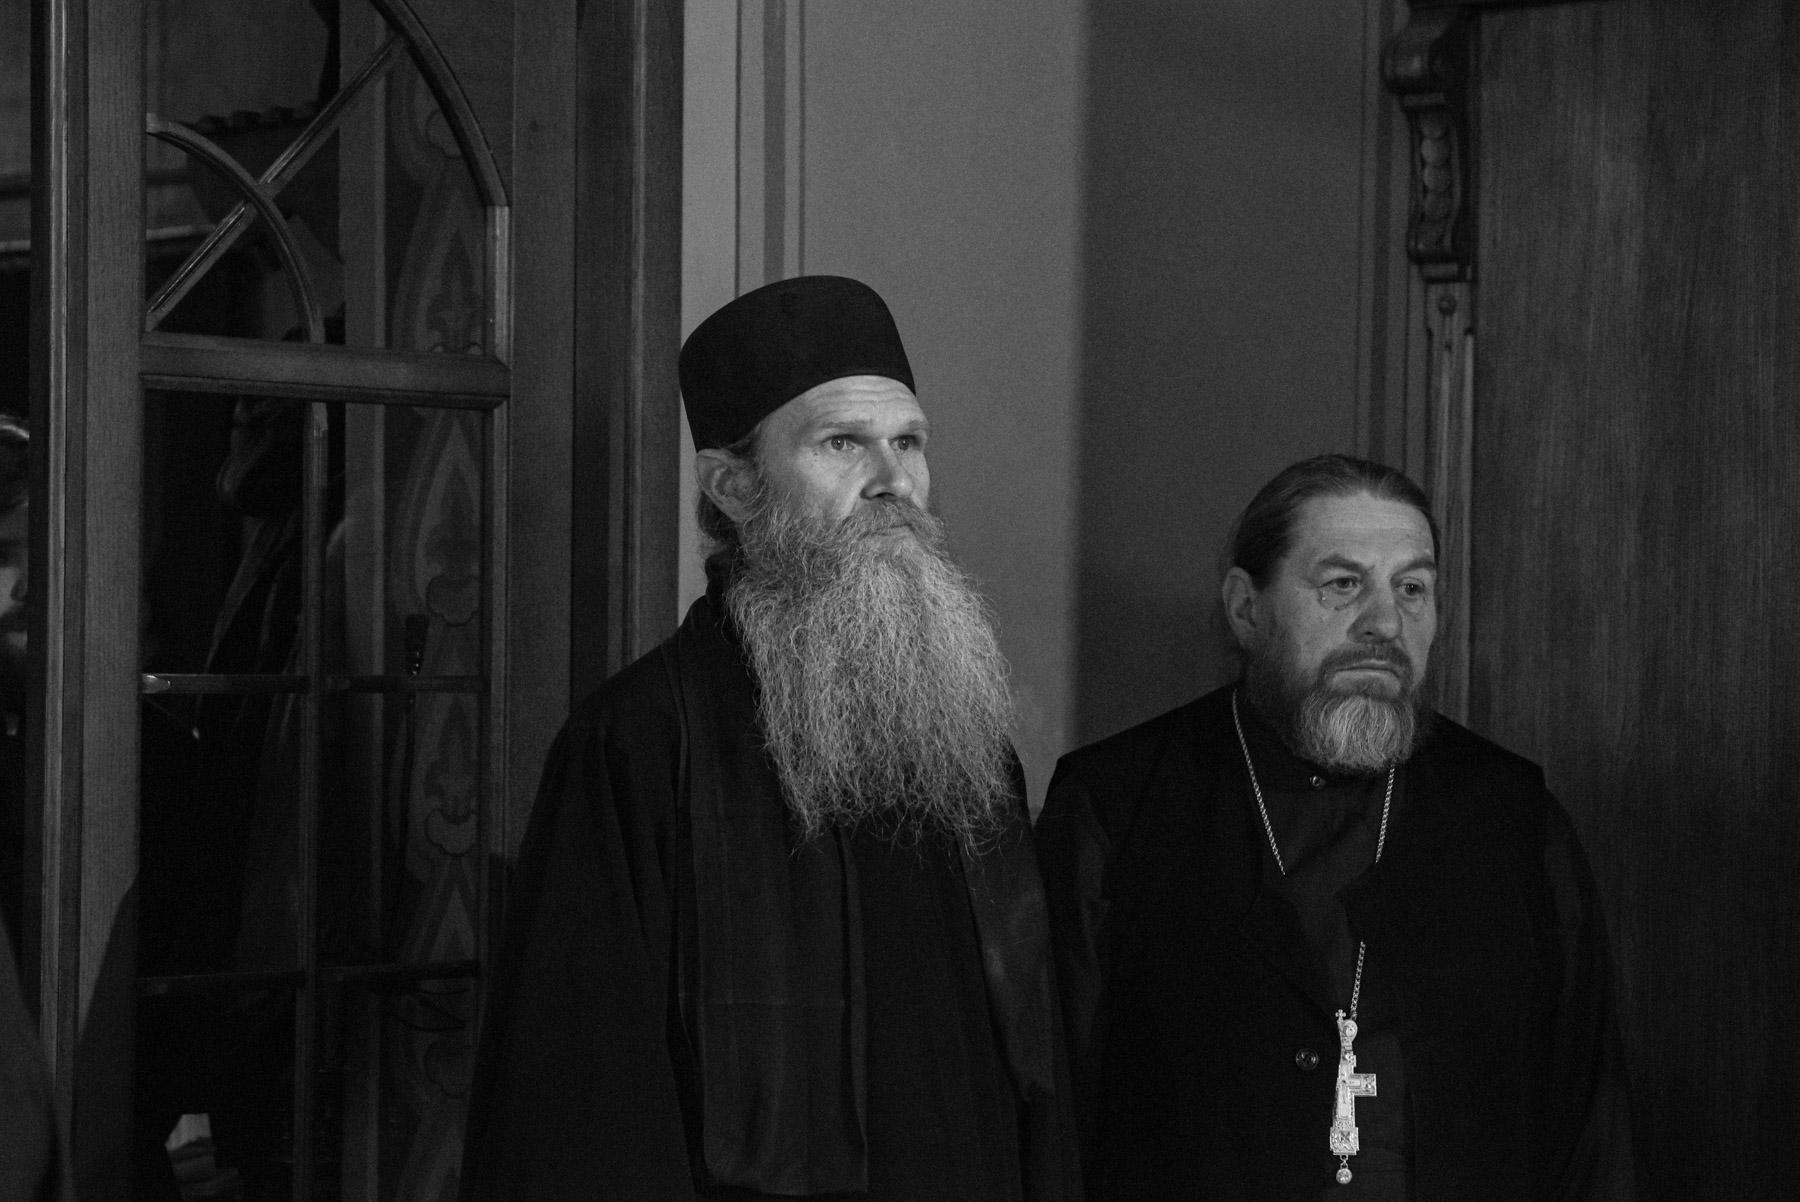 photos of orthodox christmas 0157 2